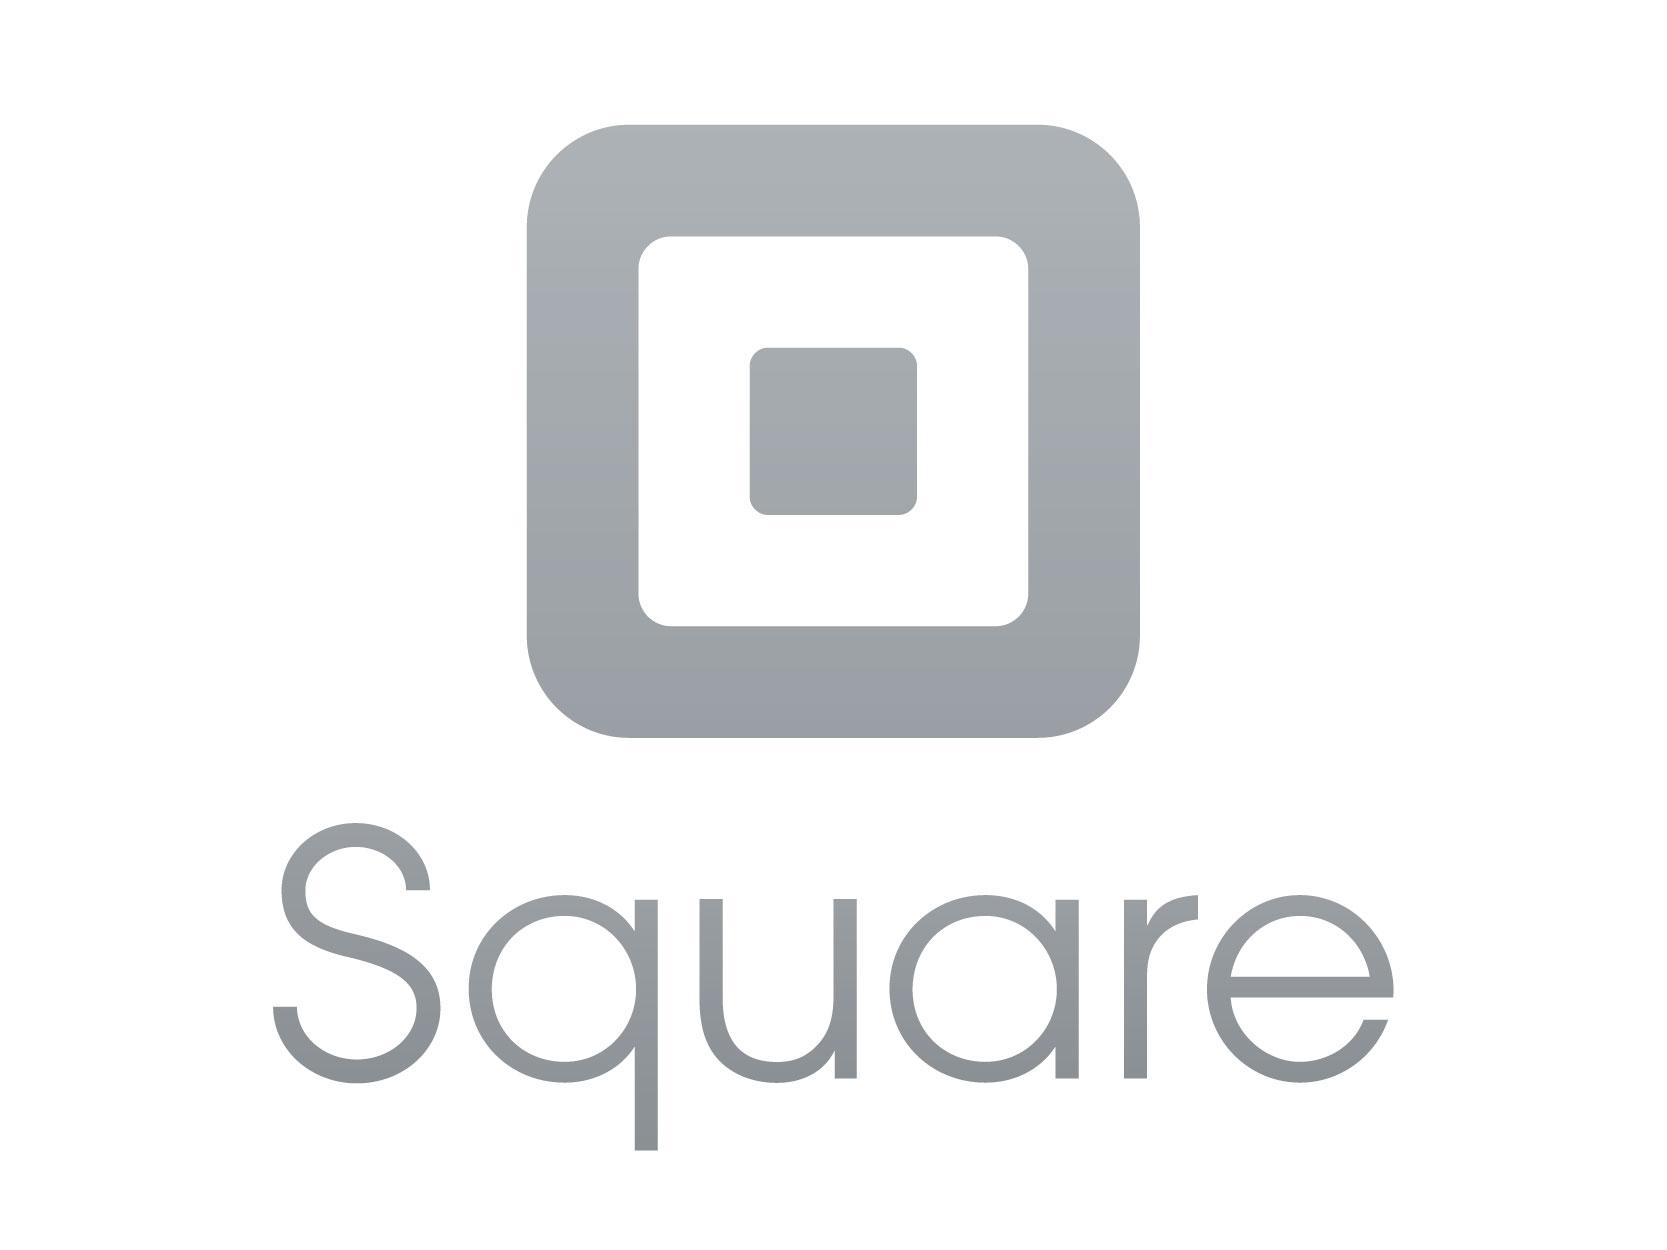 Square_Logo_Portrait.jpg